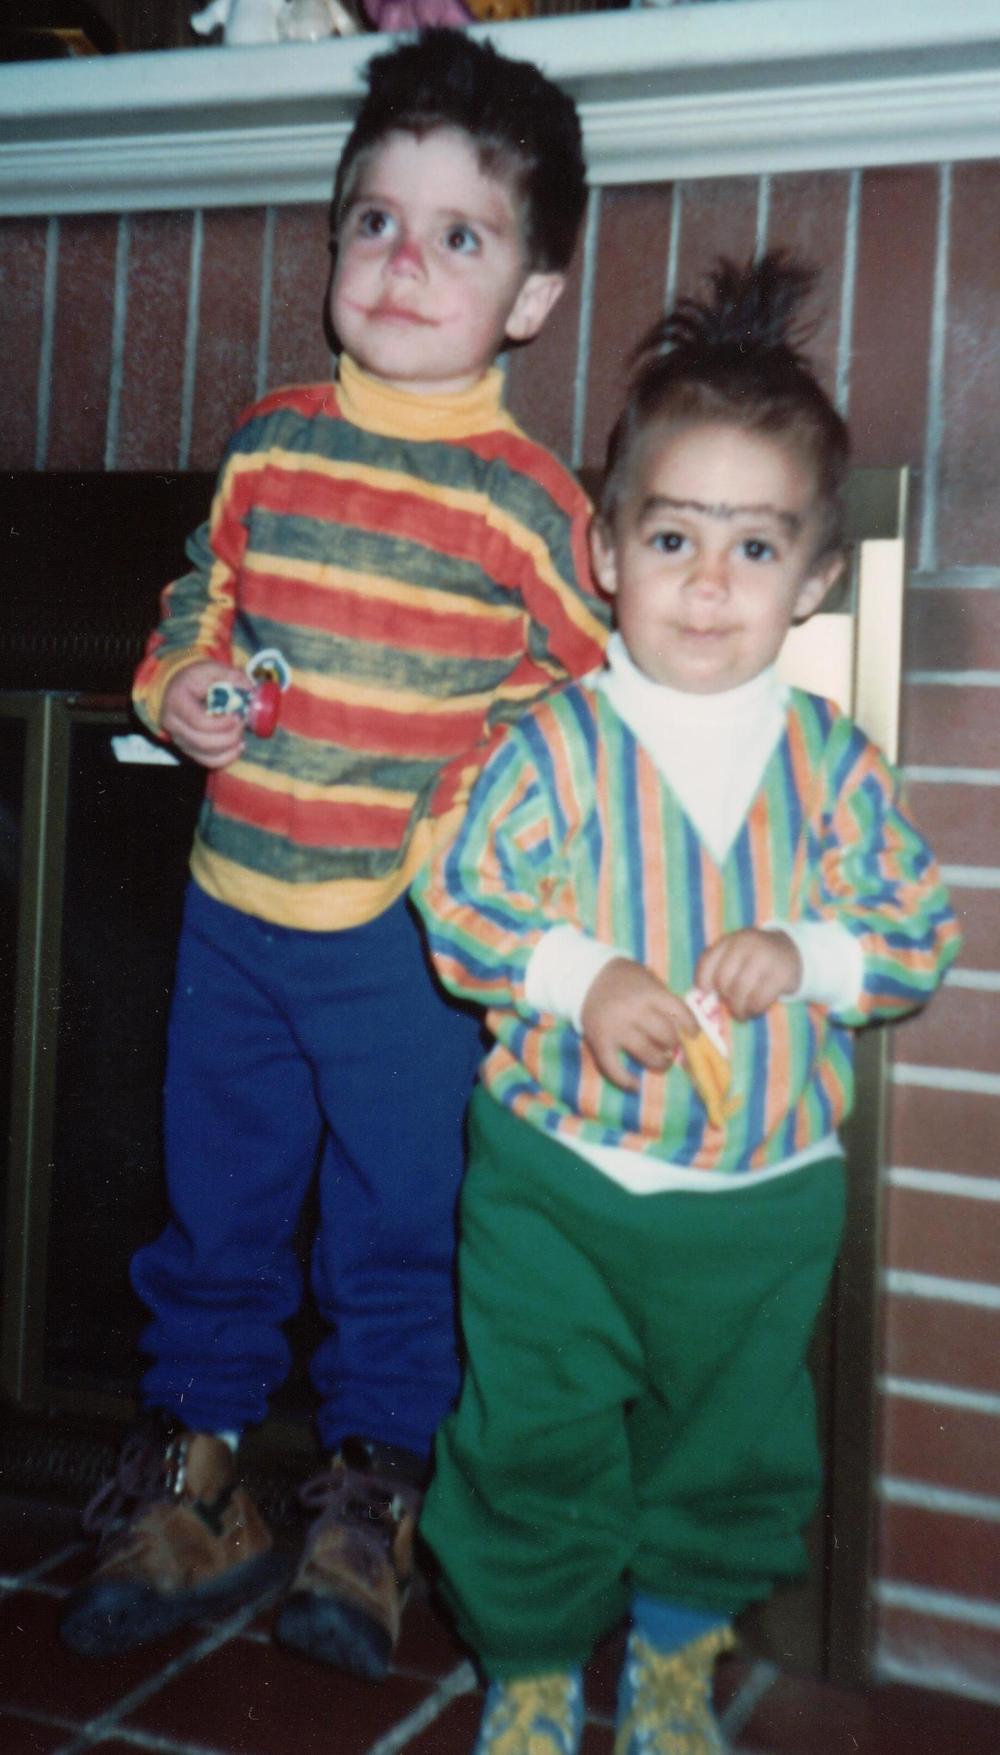 Justin & Nathan as Bert & Ernie, 1992(?)